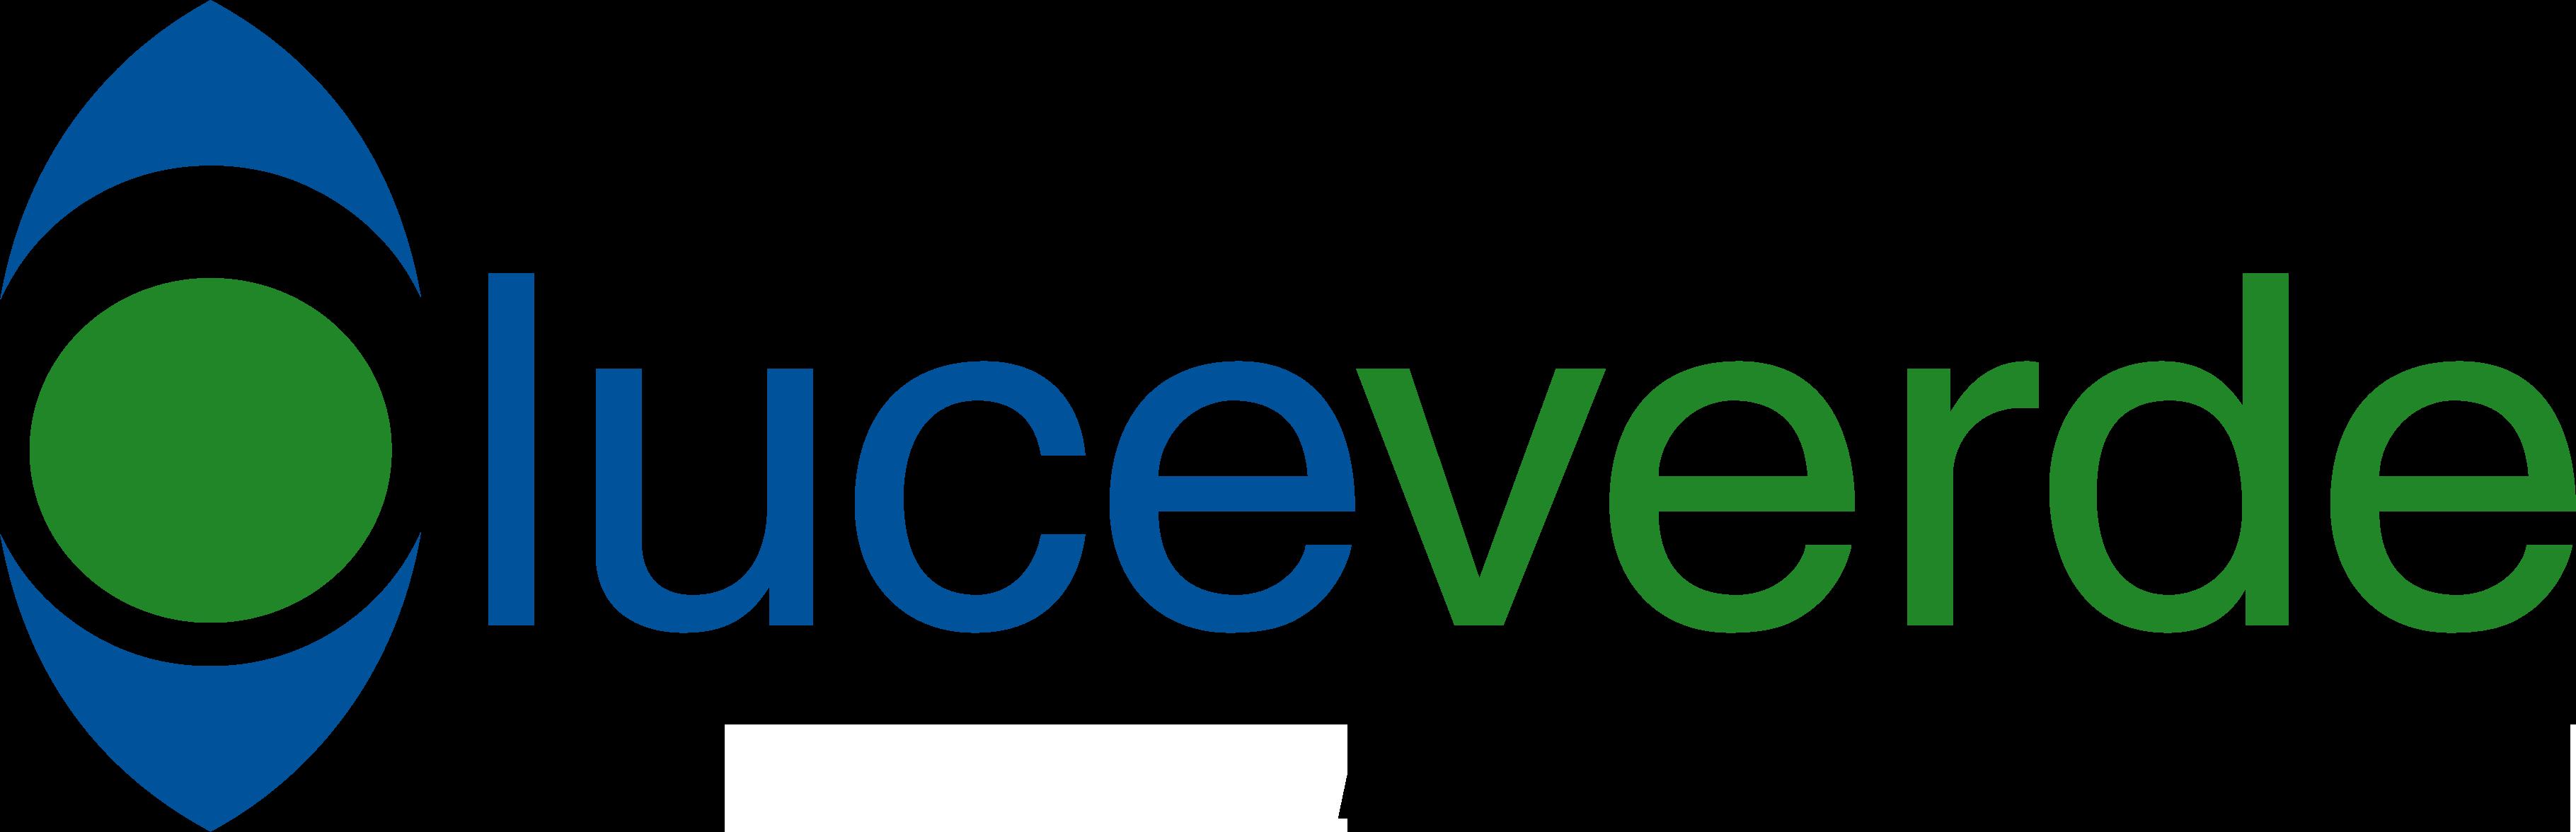 Infomobilità - Logo Luceverde - Trapani